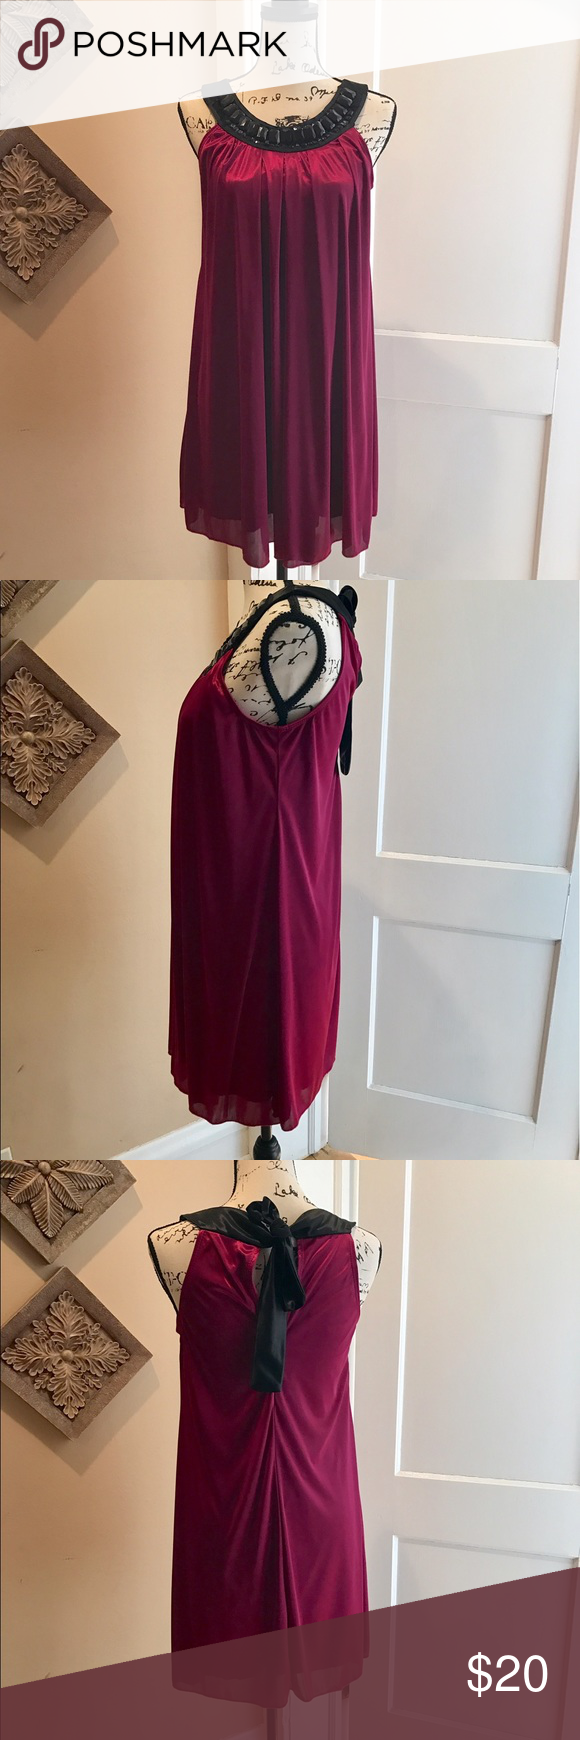 Gorgeous cocktail dress magenta and neckline